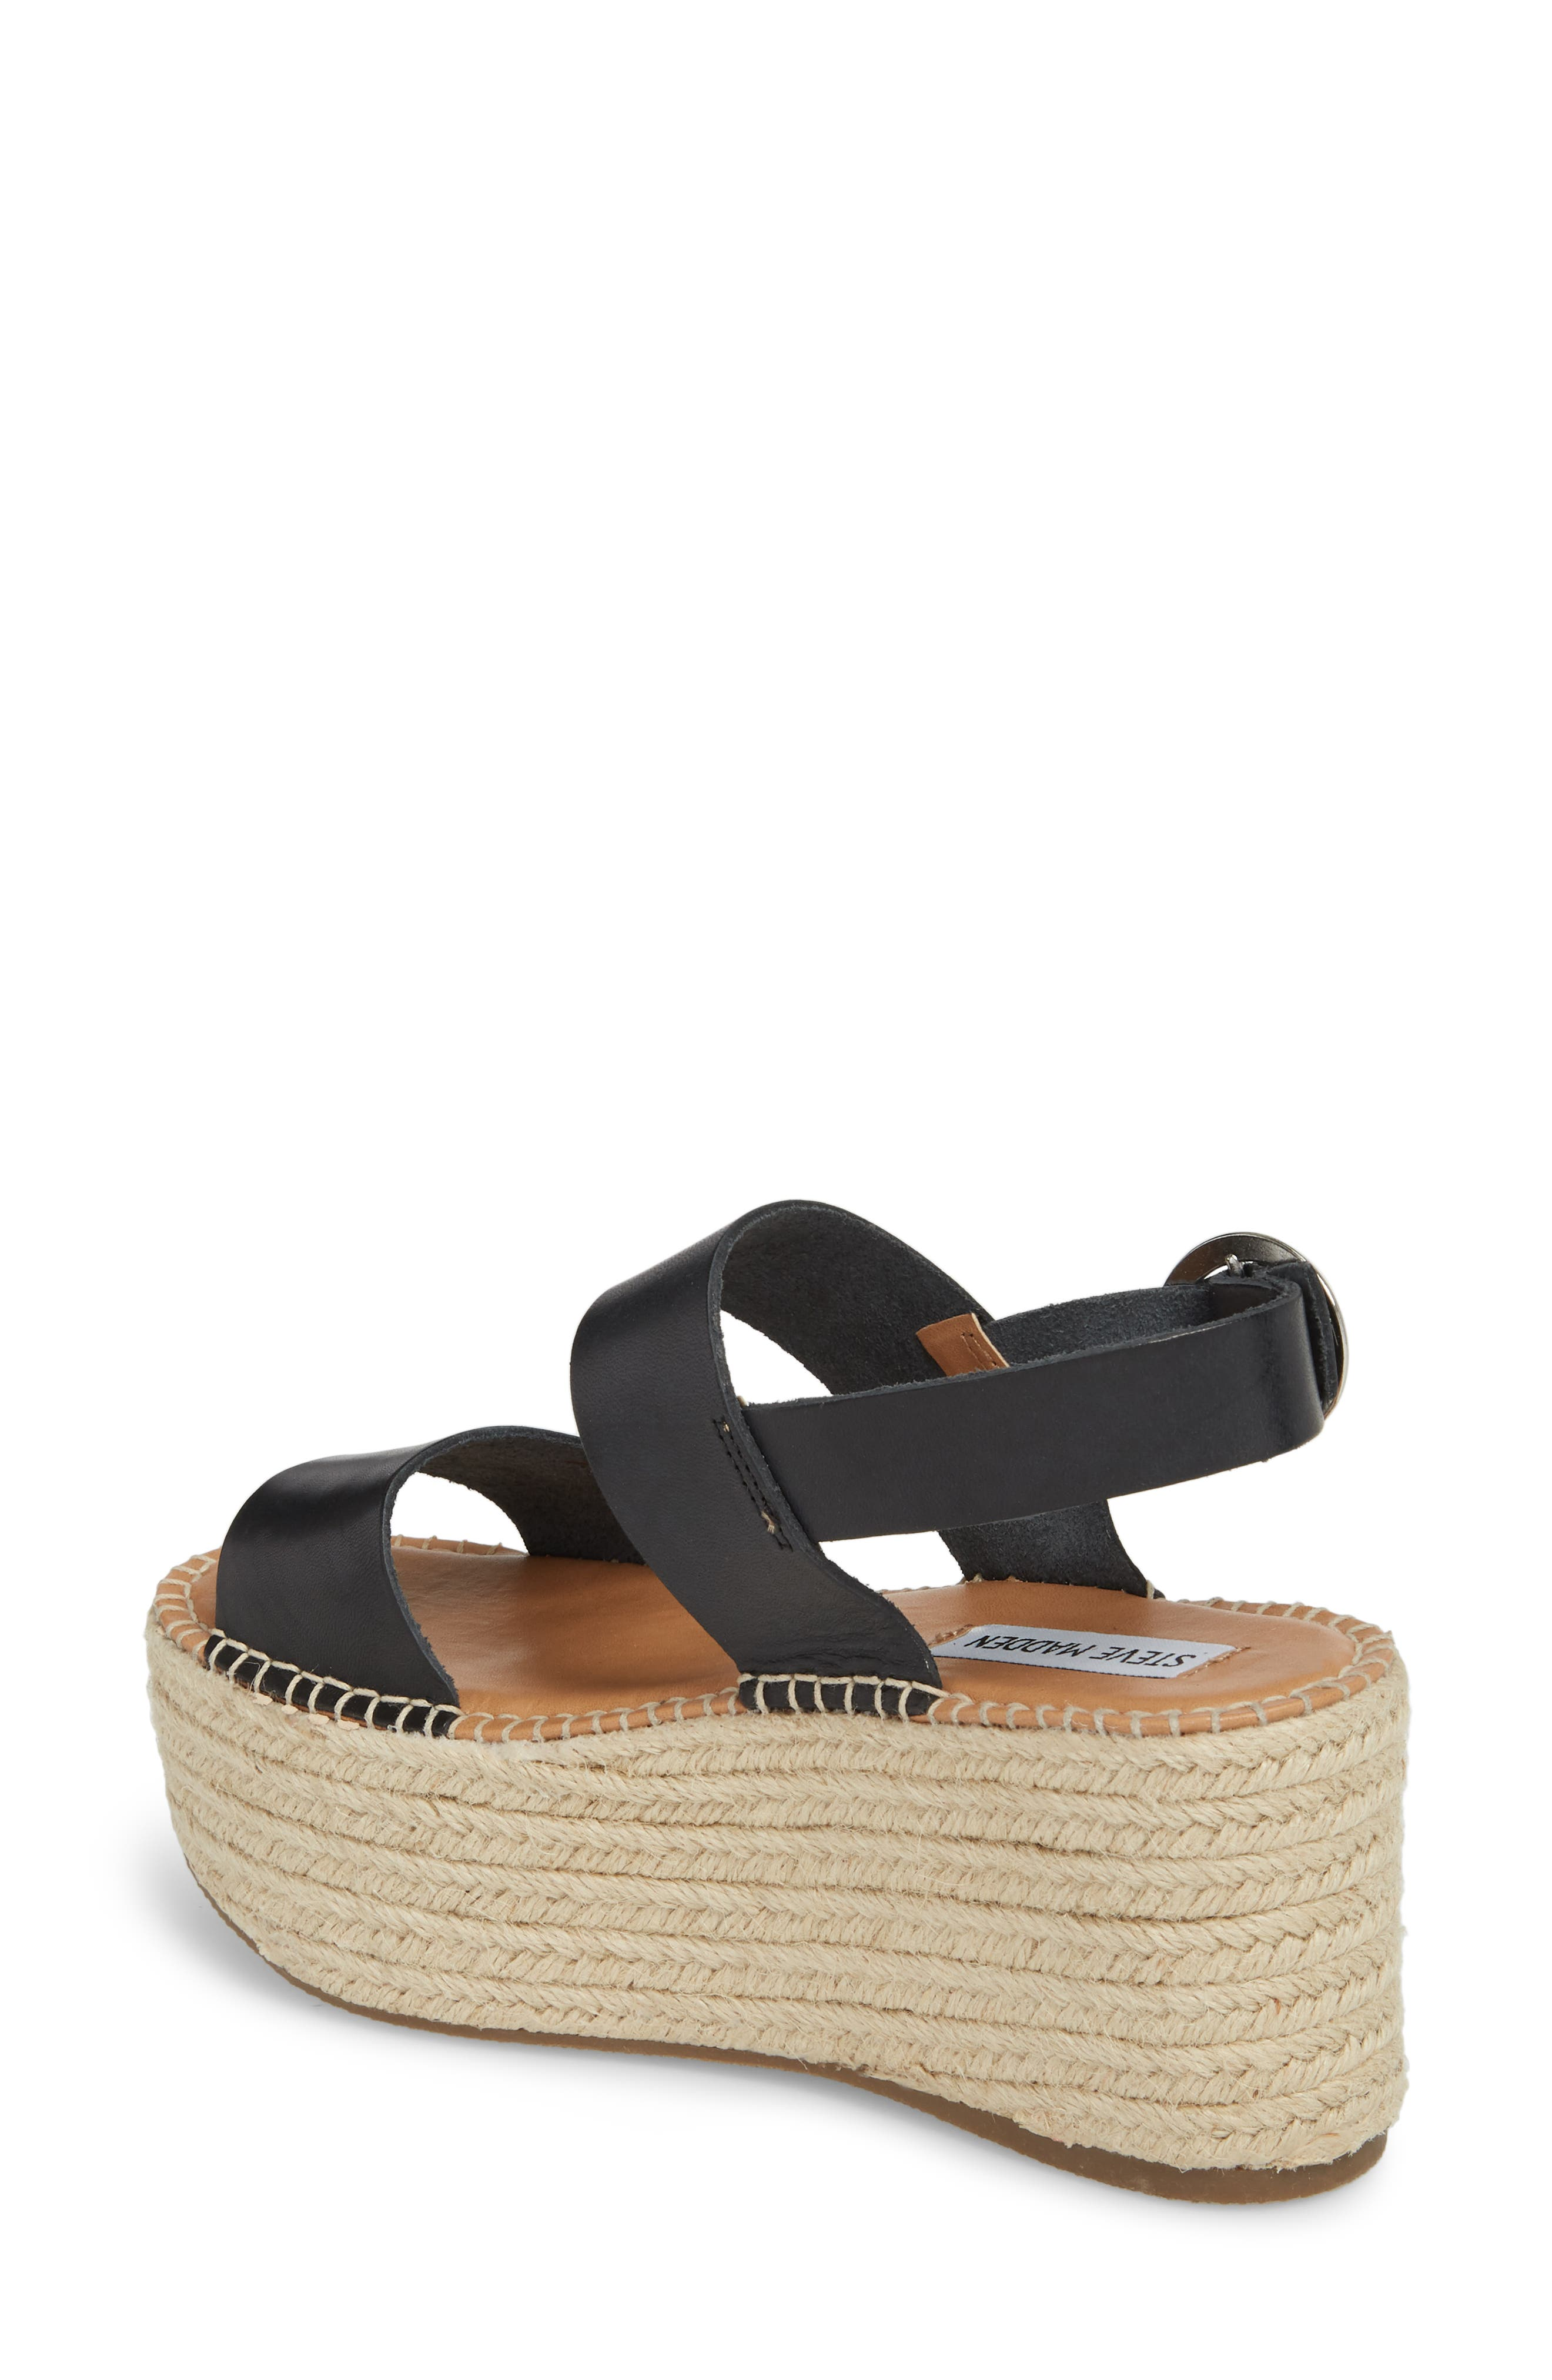 Cali Espadrille Platform Sandal,                             Alternate thumbnail 4, color,